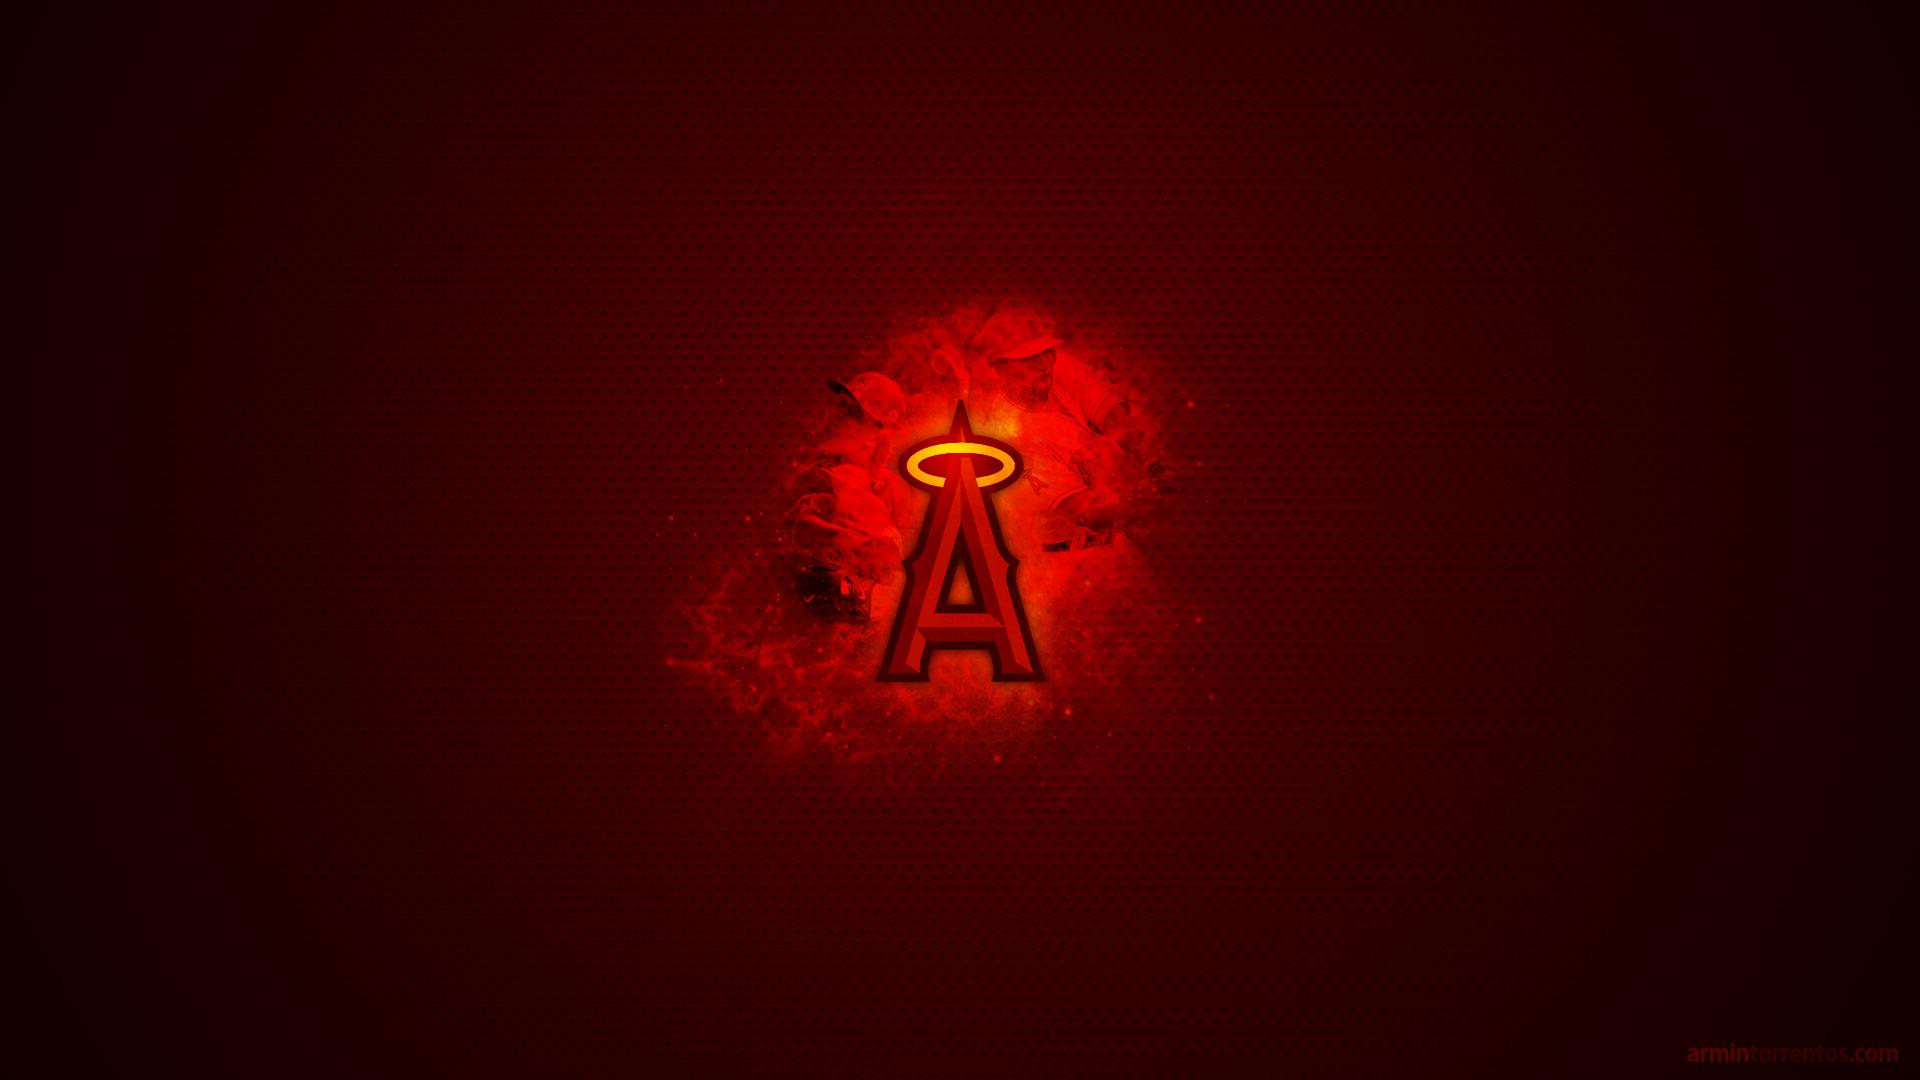 ANAHEIM ANGELS baseball mlb eh wallpaper 1920x1080 158466 1920x1080